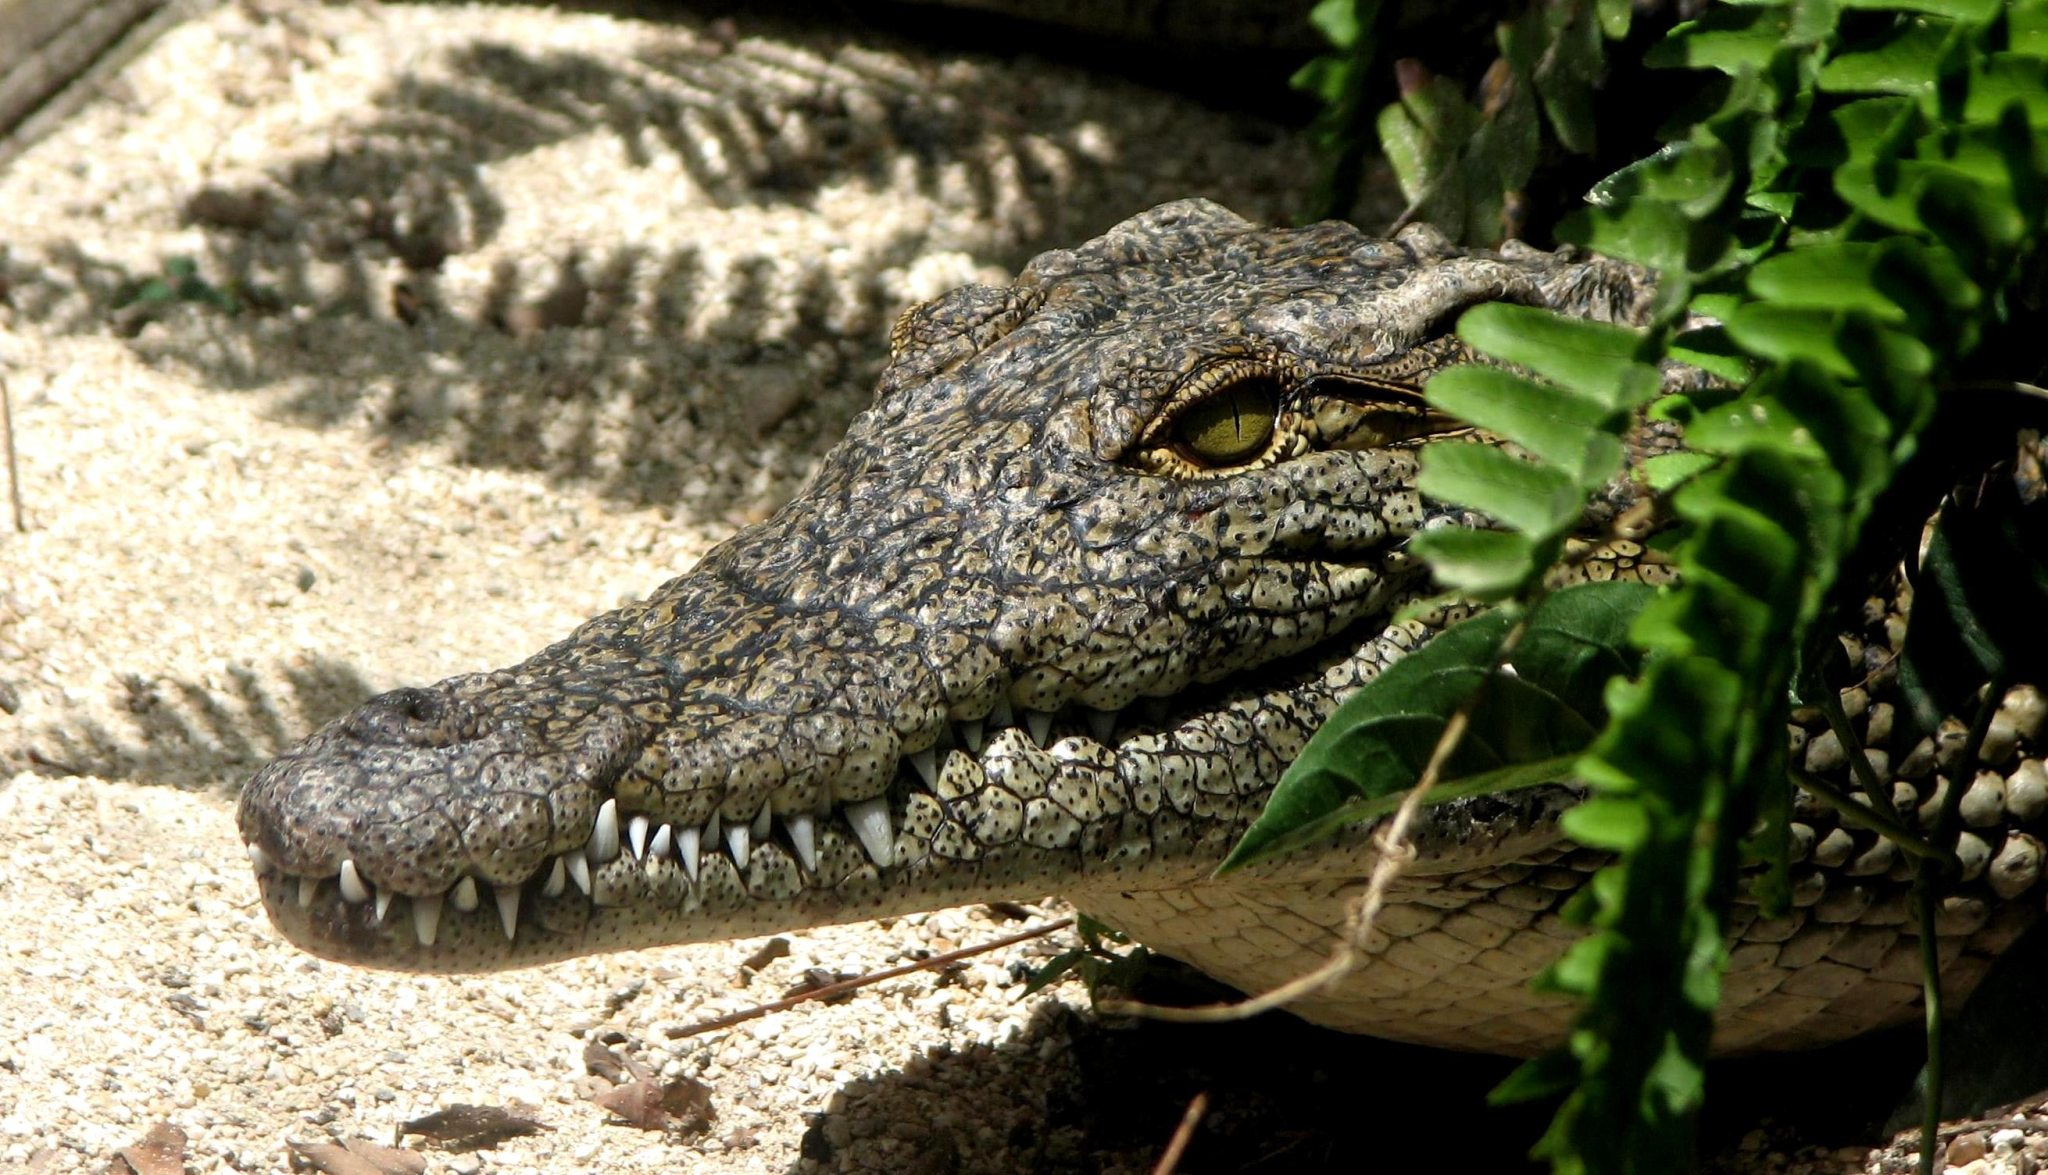 alligator-amphibian-animal-347721. pexels.com